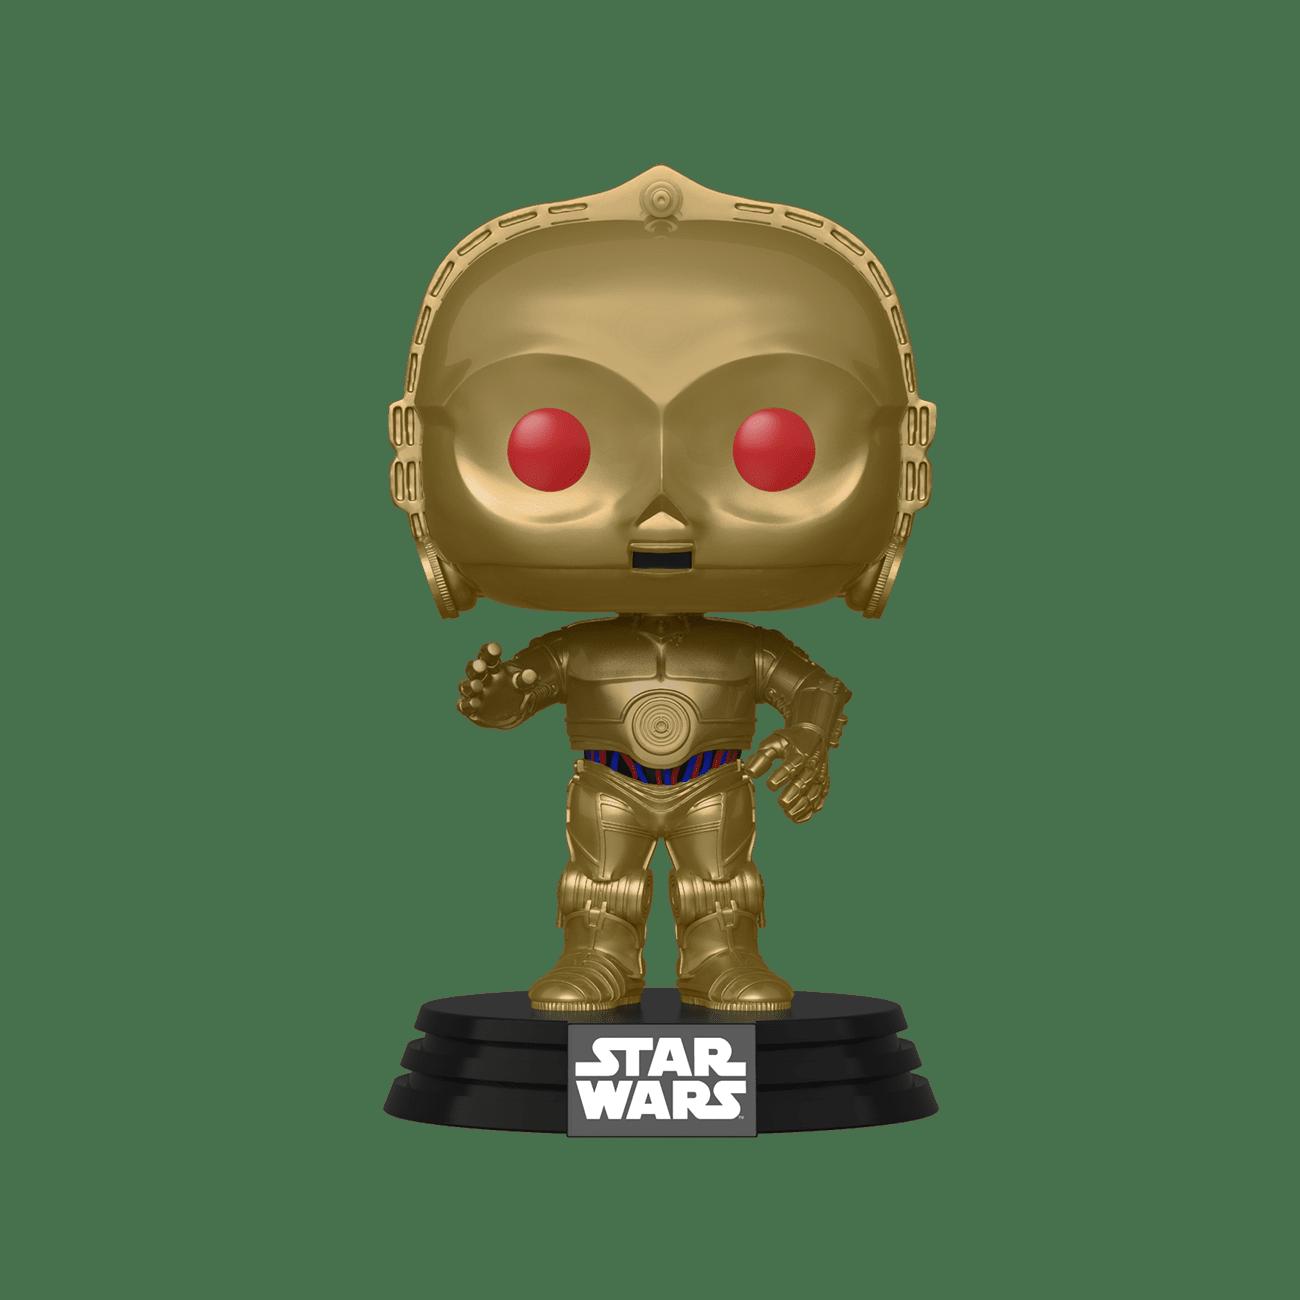 Star Wars: Rise of Skywalker C-3PO Red Eye Pop! Vinyl Figure